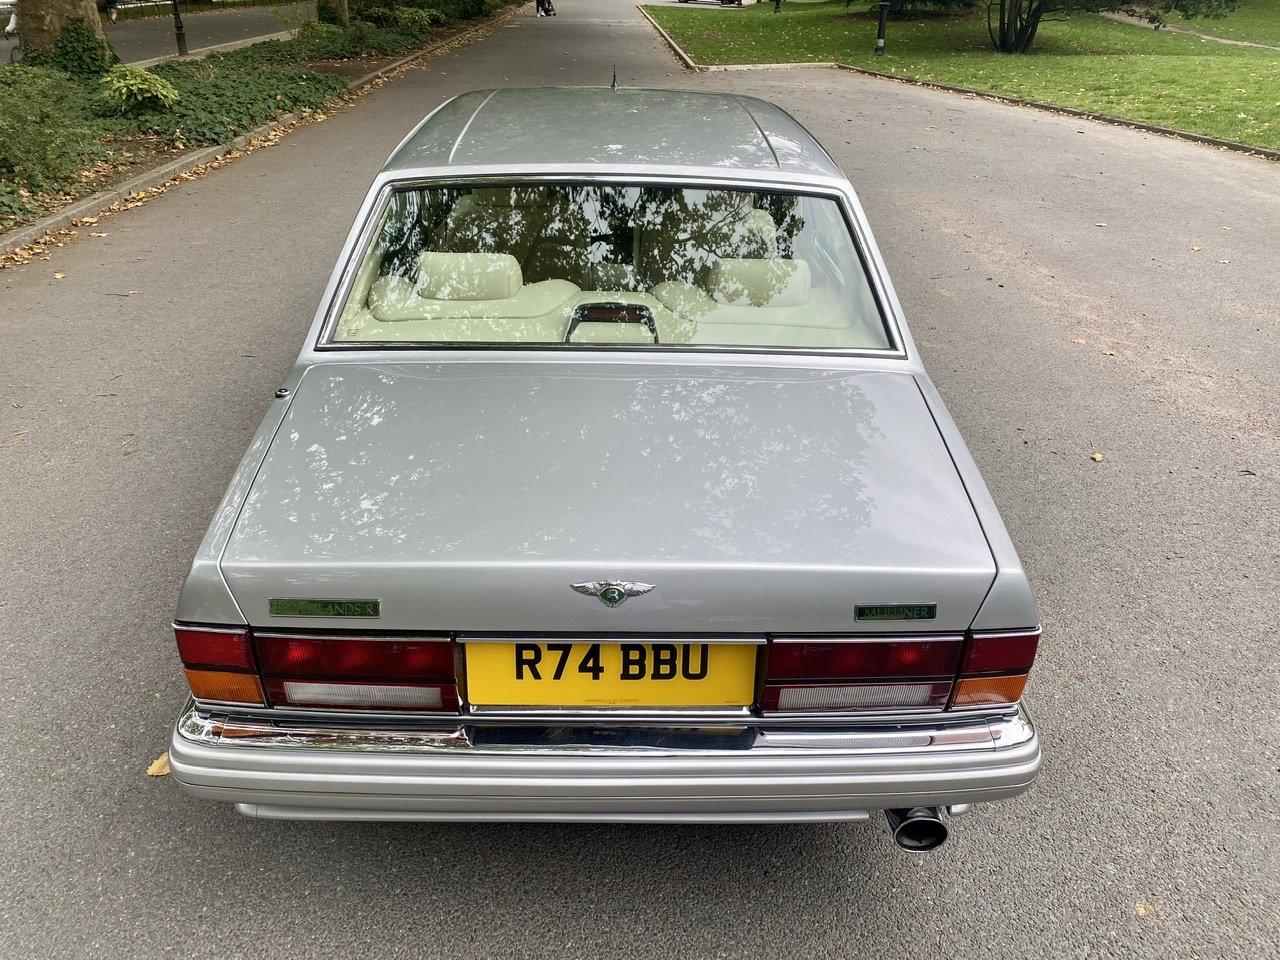 1998 Bentley Brooklands 'R' Mulliner For Sale (picture 11 of 22)